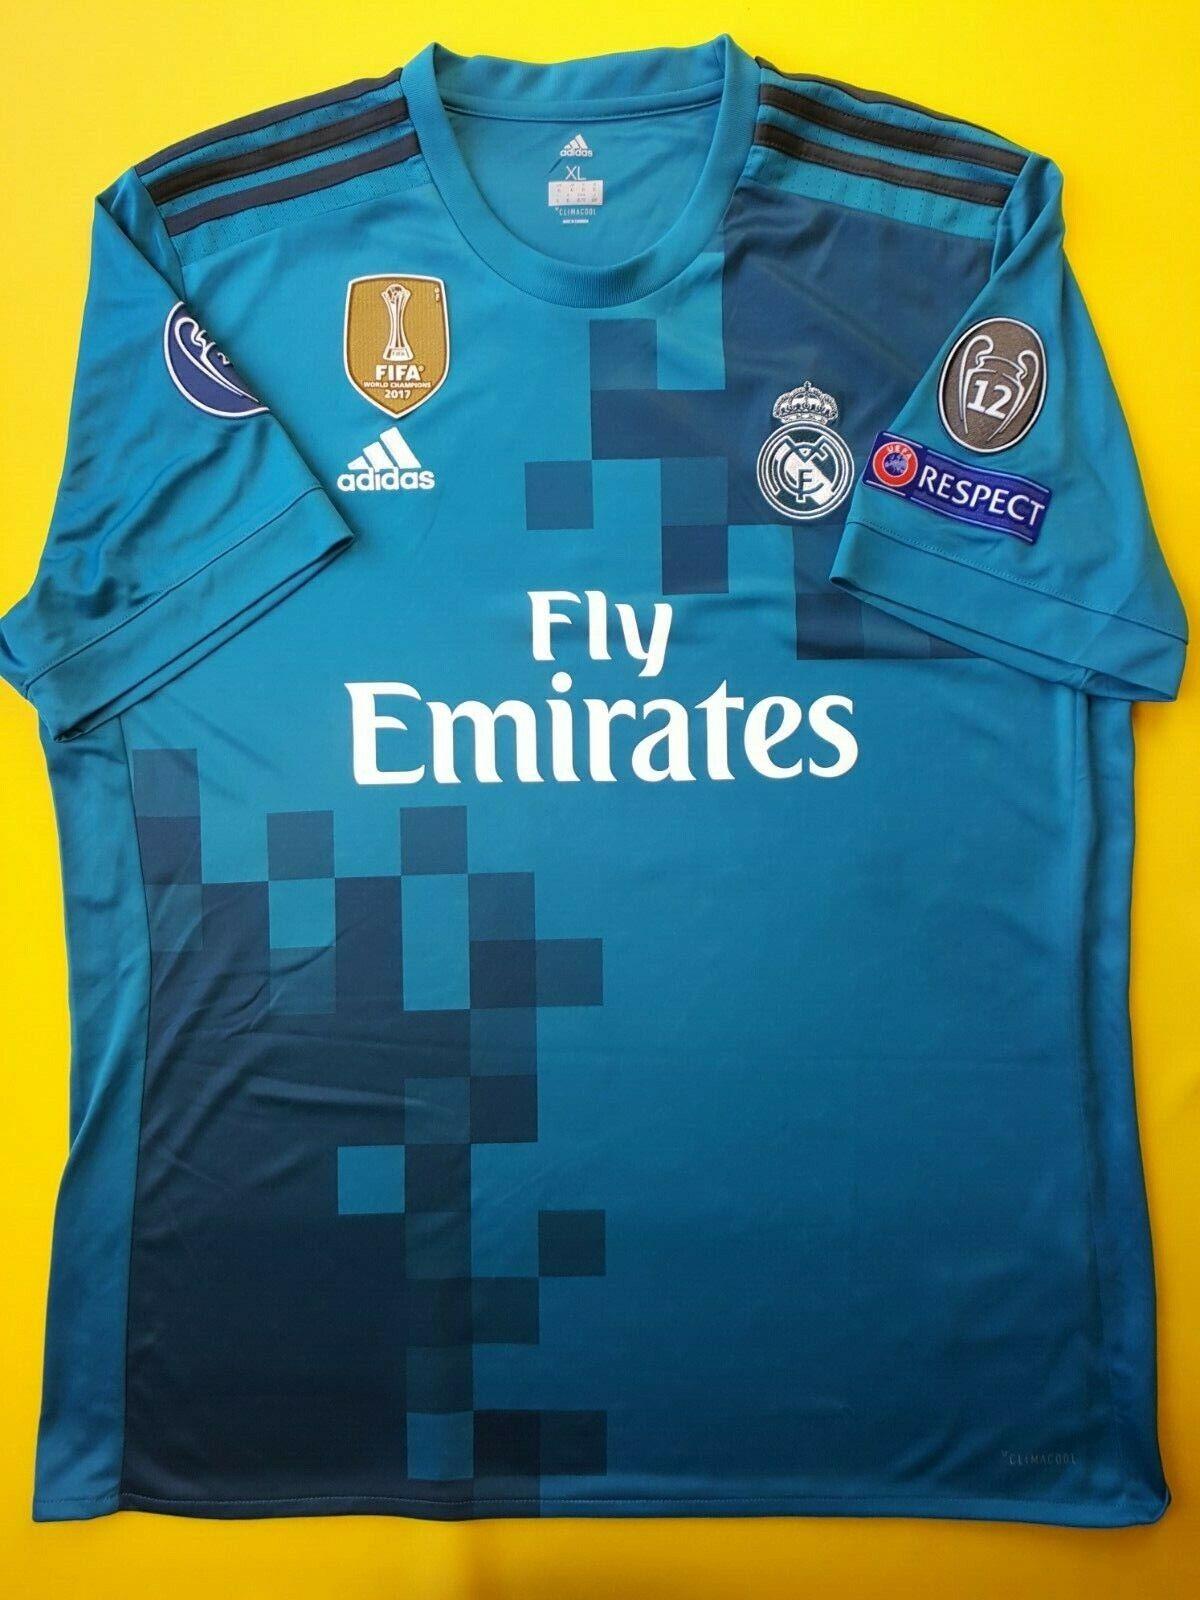 8c4e3eb5a 4.9 5 Real Madrid third jersey XL 2018 shirt soccer Adidas football ig93